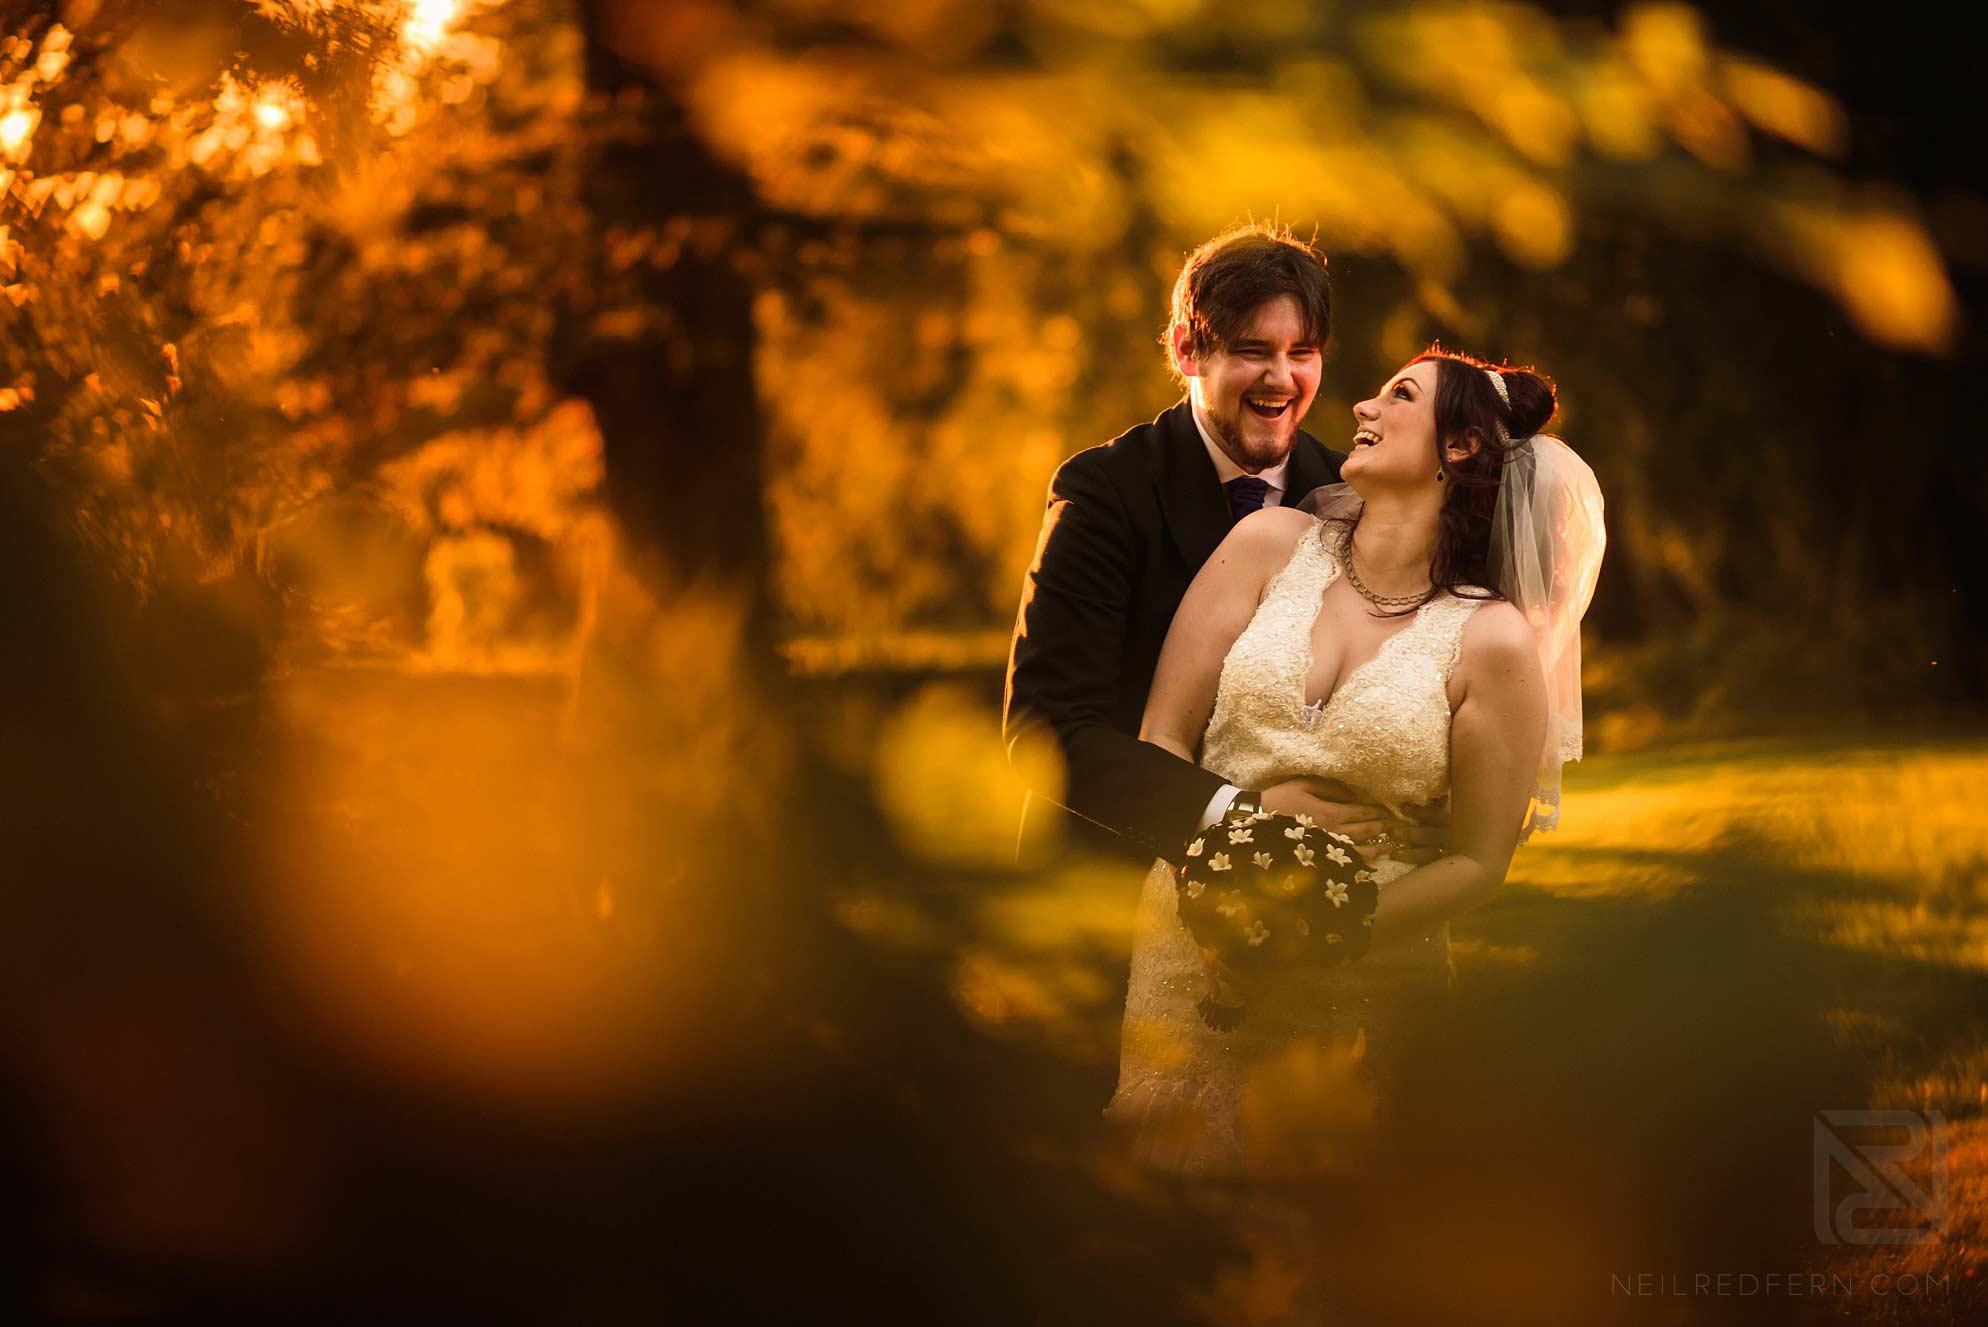 summer wedding photograph of newlyweds